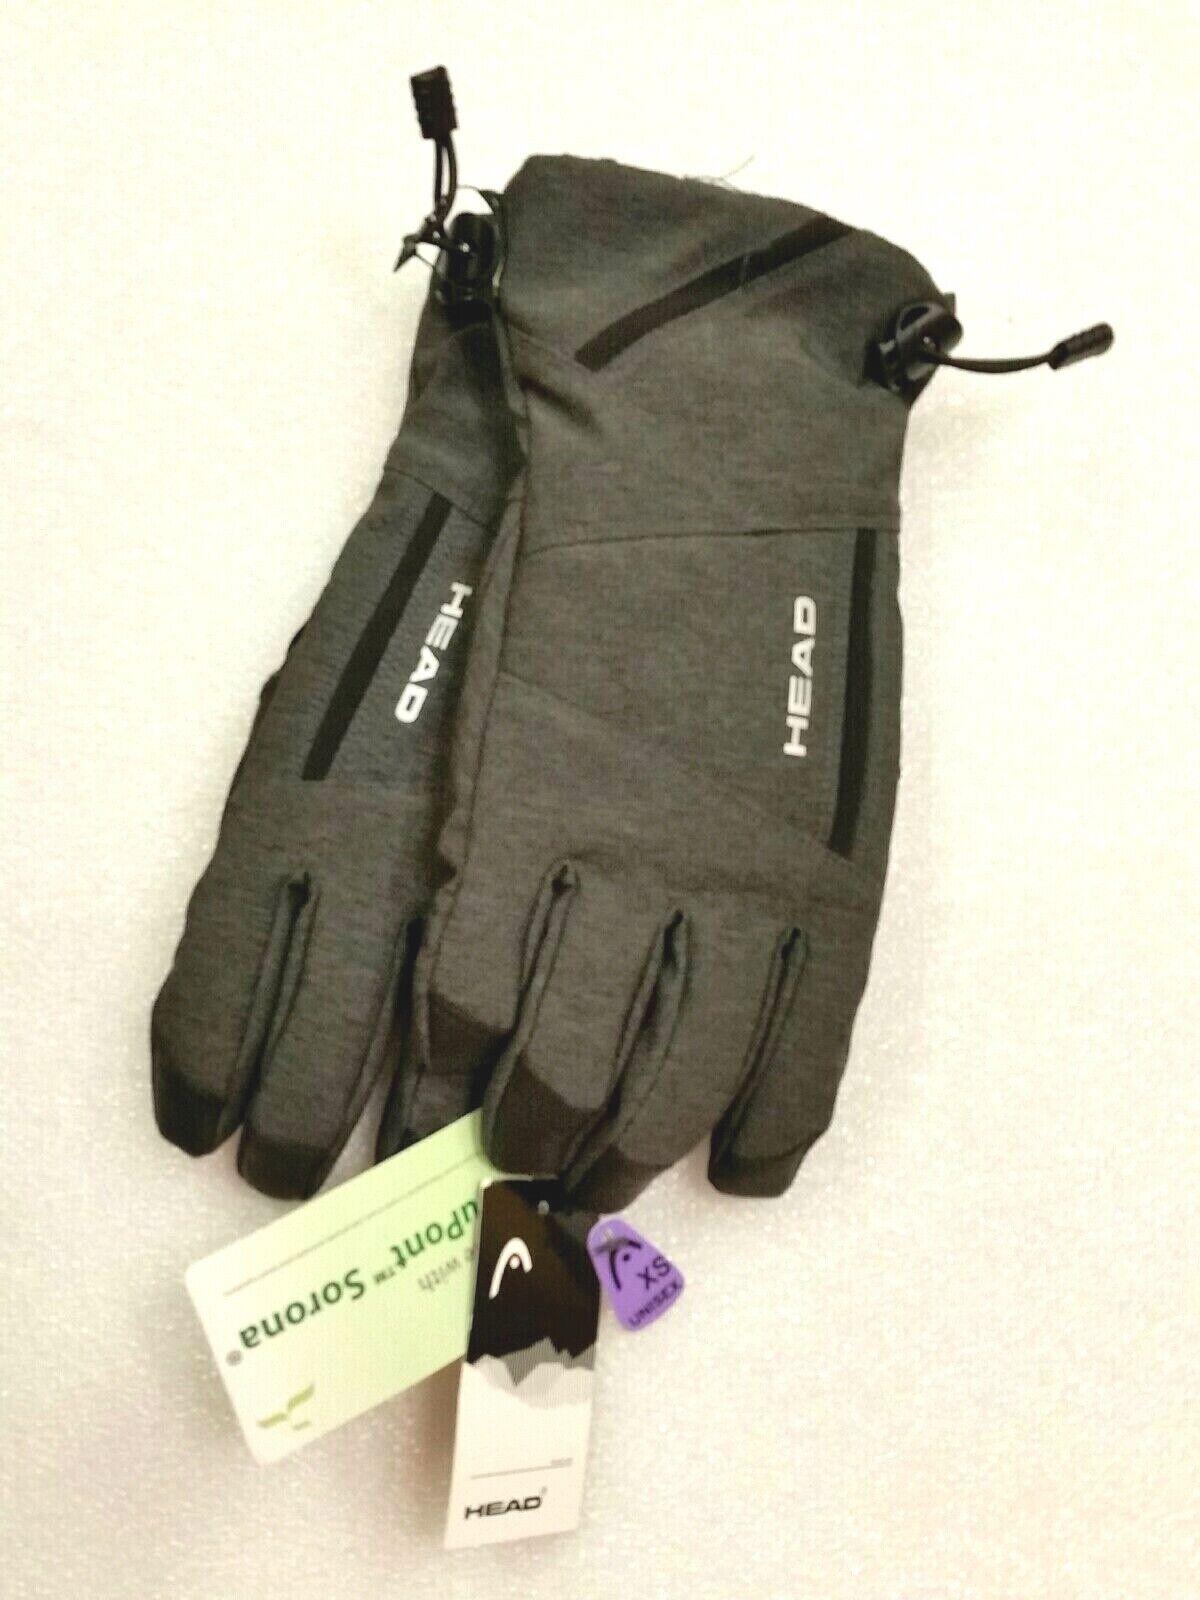 Head Unisex Sensatec Gloves Touchscreen Compatible, Gray Size X Small, RN 87312